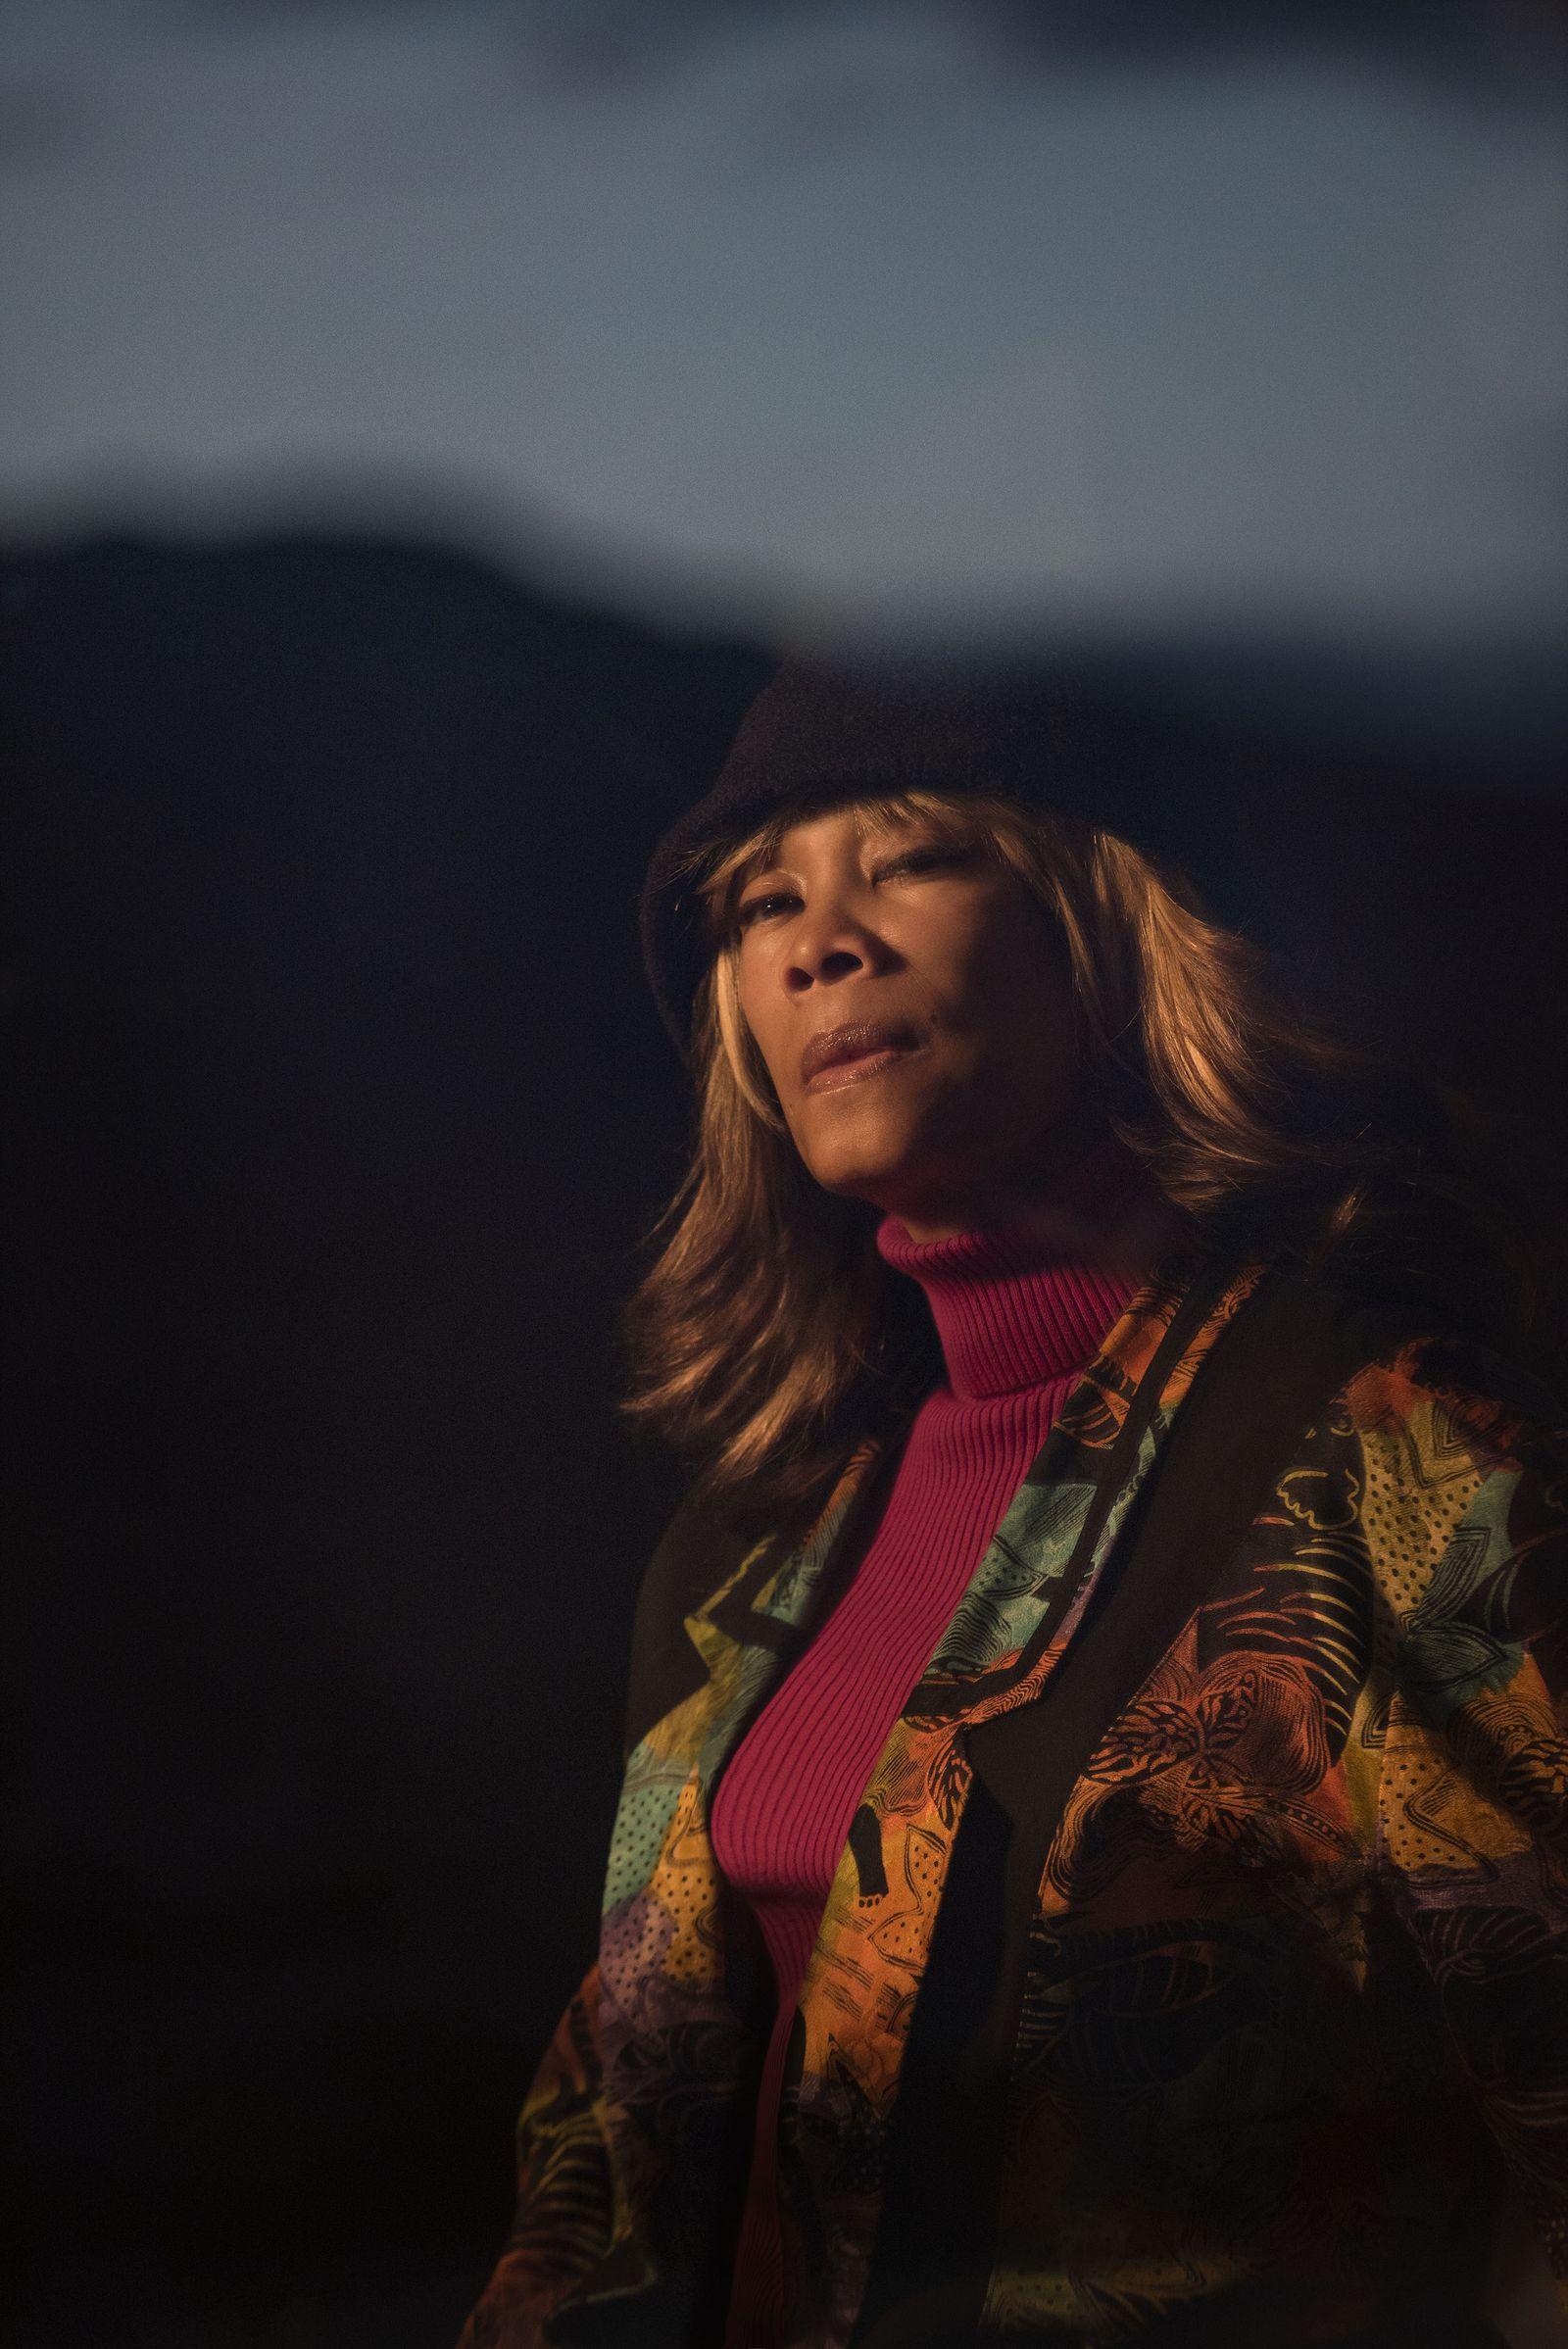 Lithofayne Pridgon: Jimi Hendrix's original 'foxy lady'.